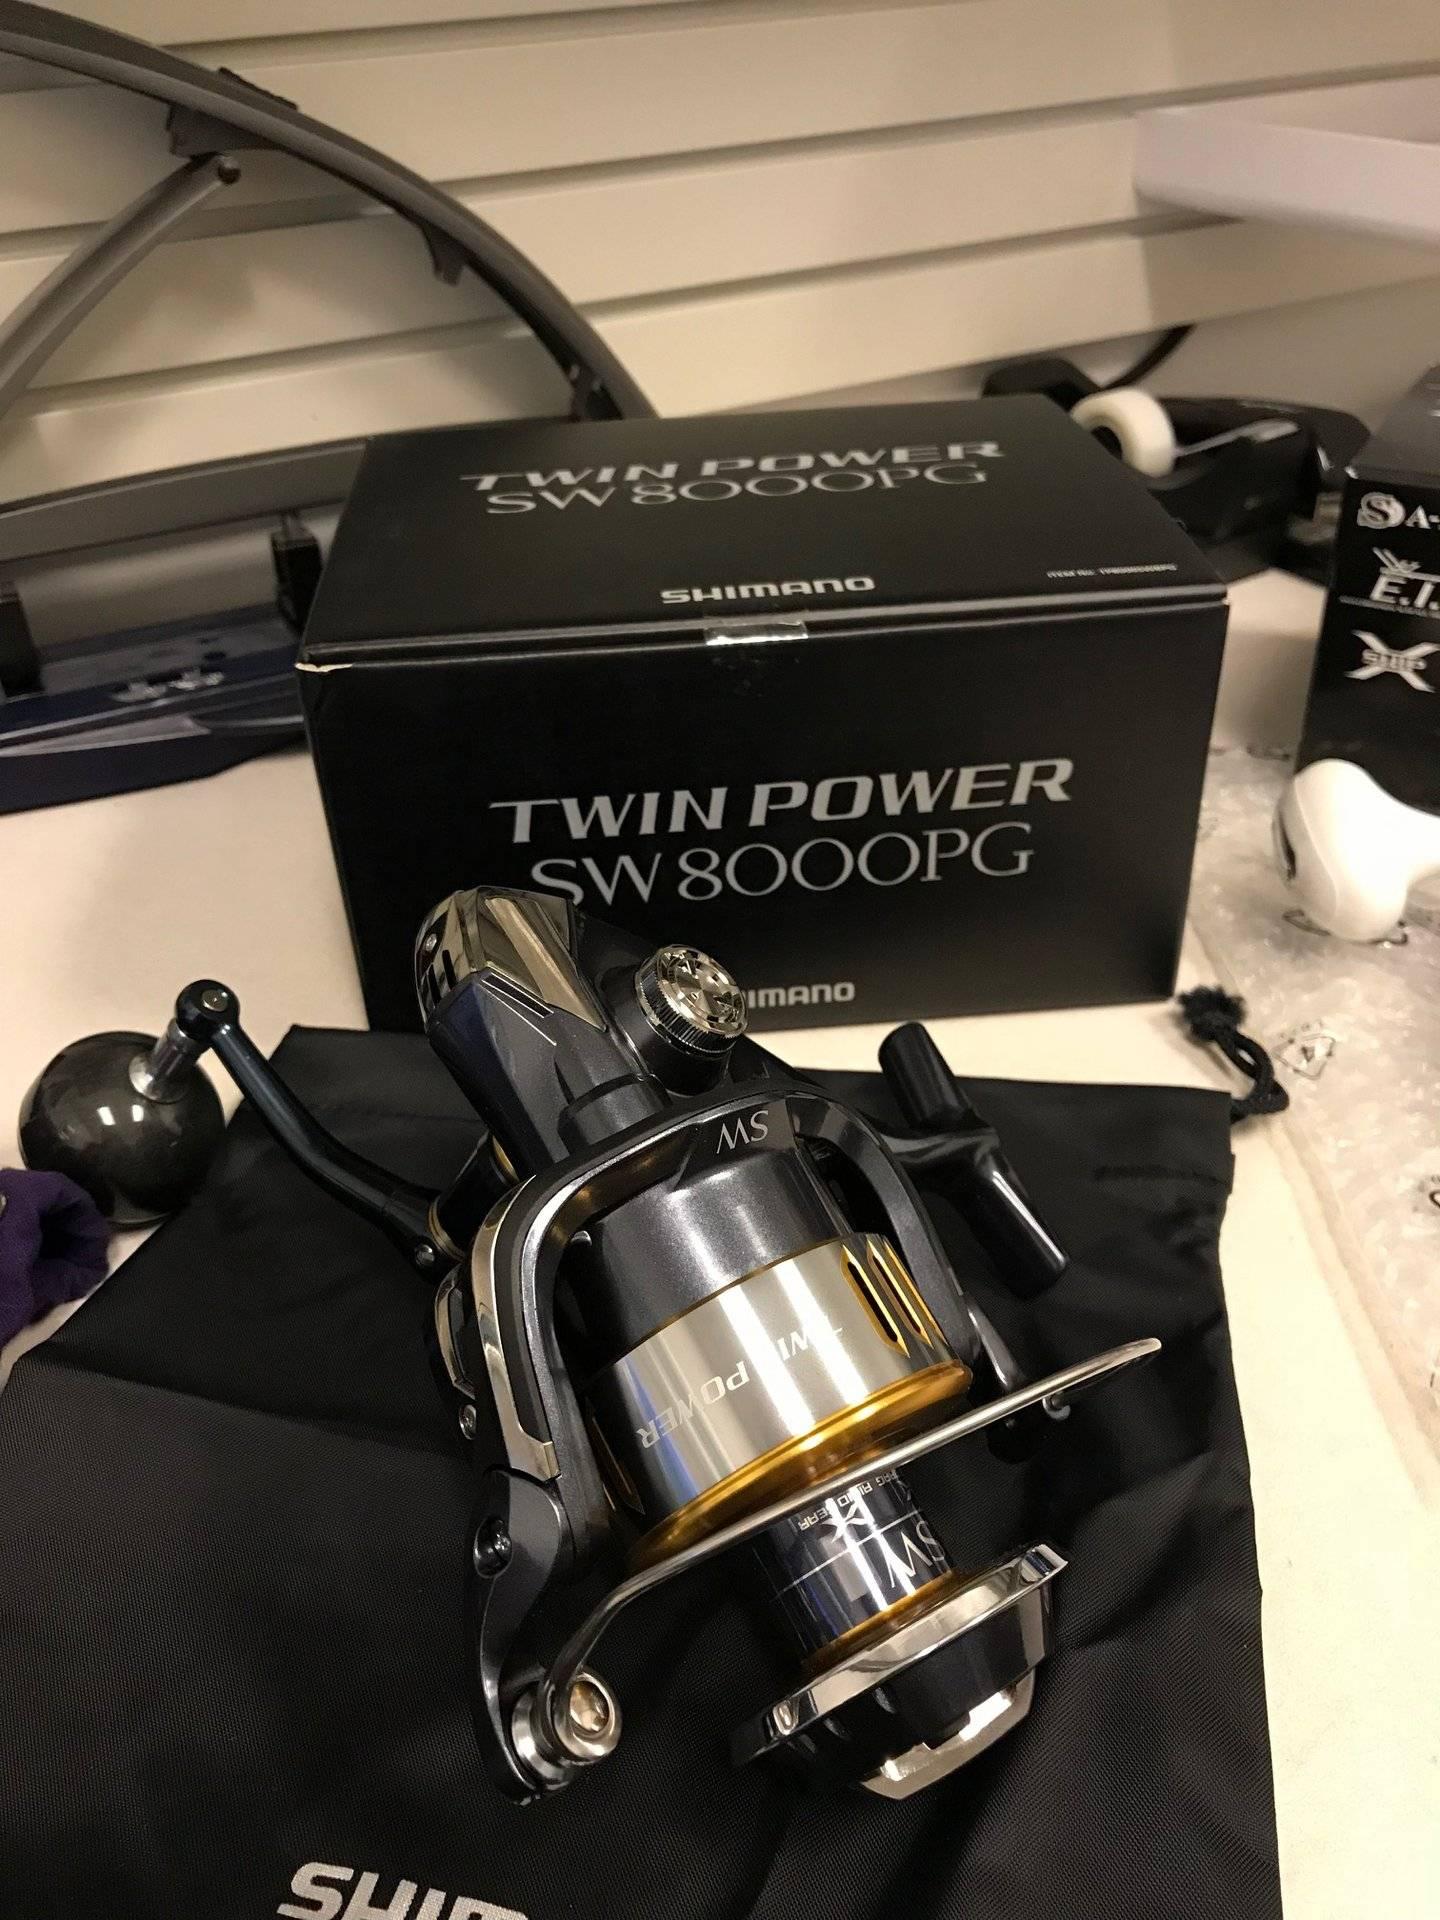 Shimano Twinpower 8000 NEW $540 | Bloodydecks